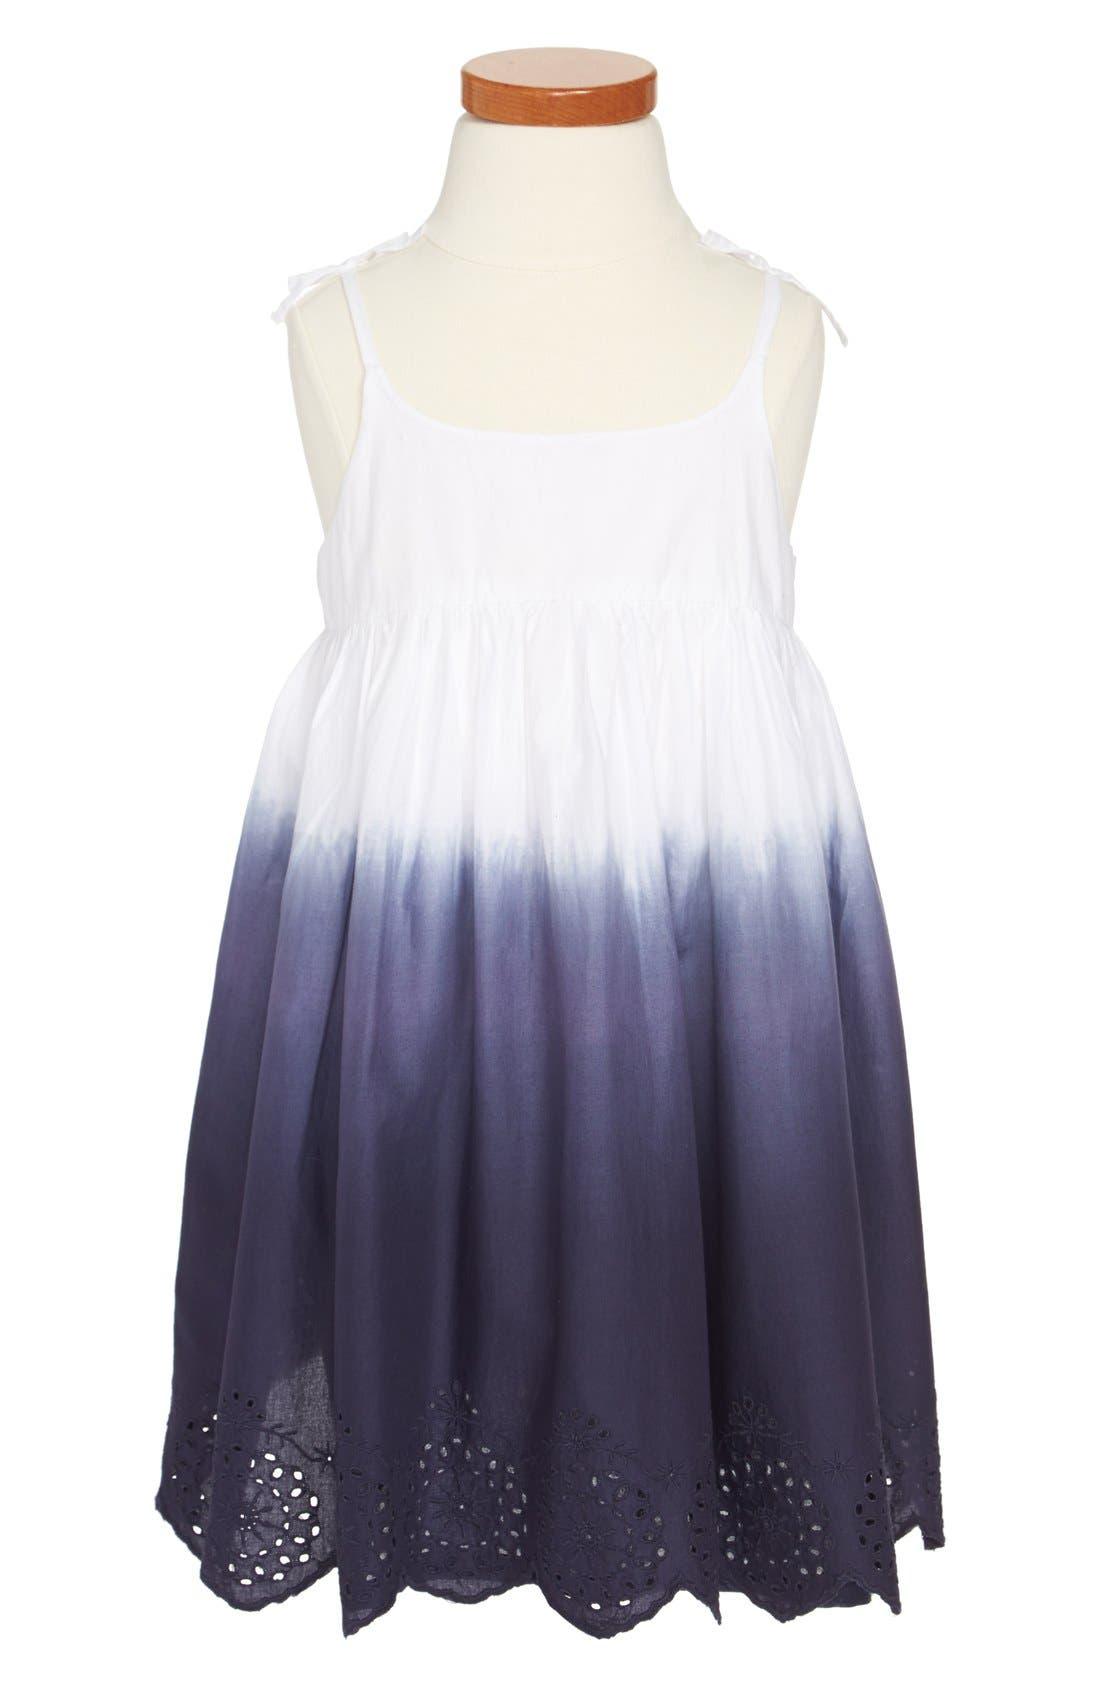 Main Image - Tucker + Tate 'Maya' Sleeveless Dress (Toddler Girls, Little Girls & Big Girls)